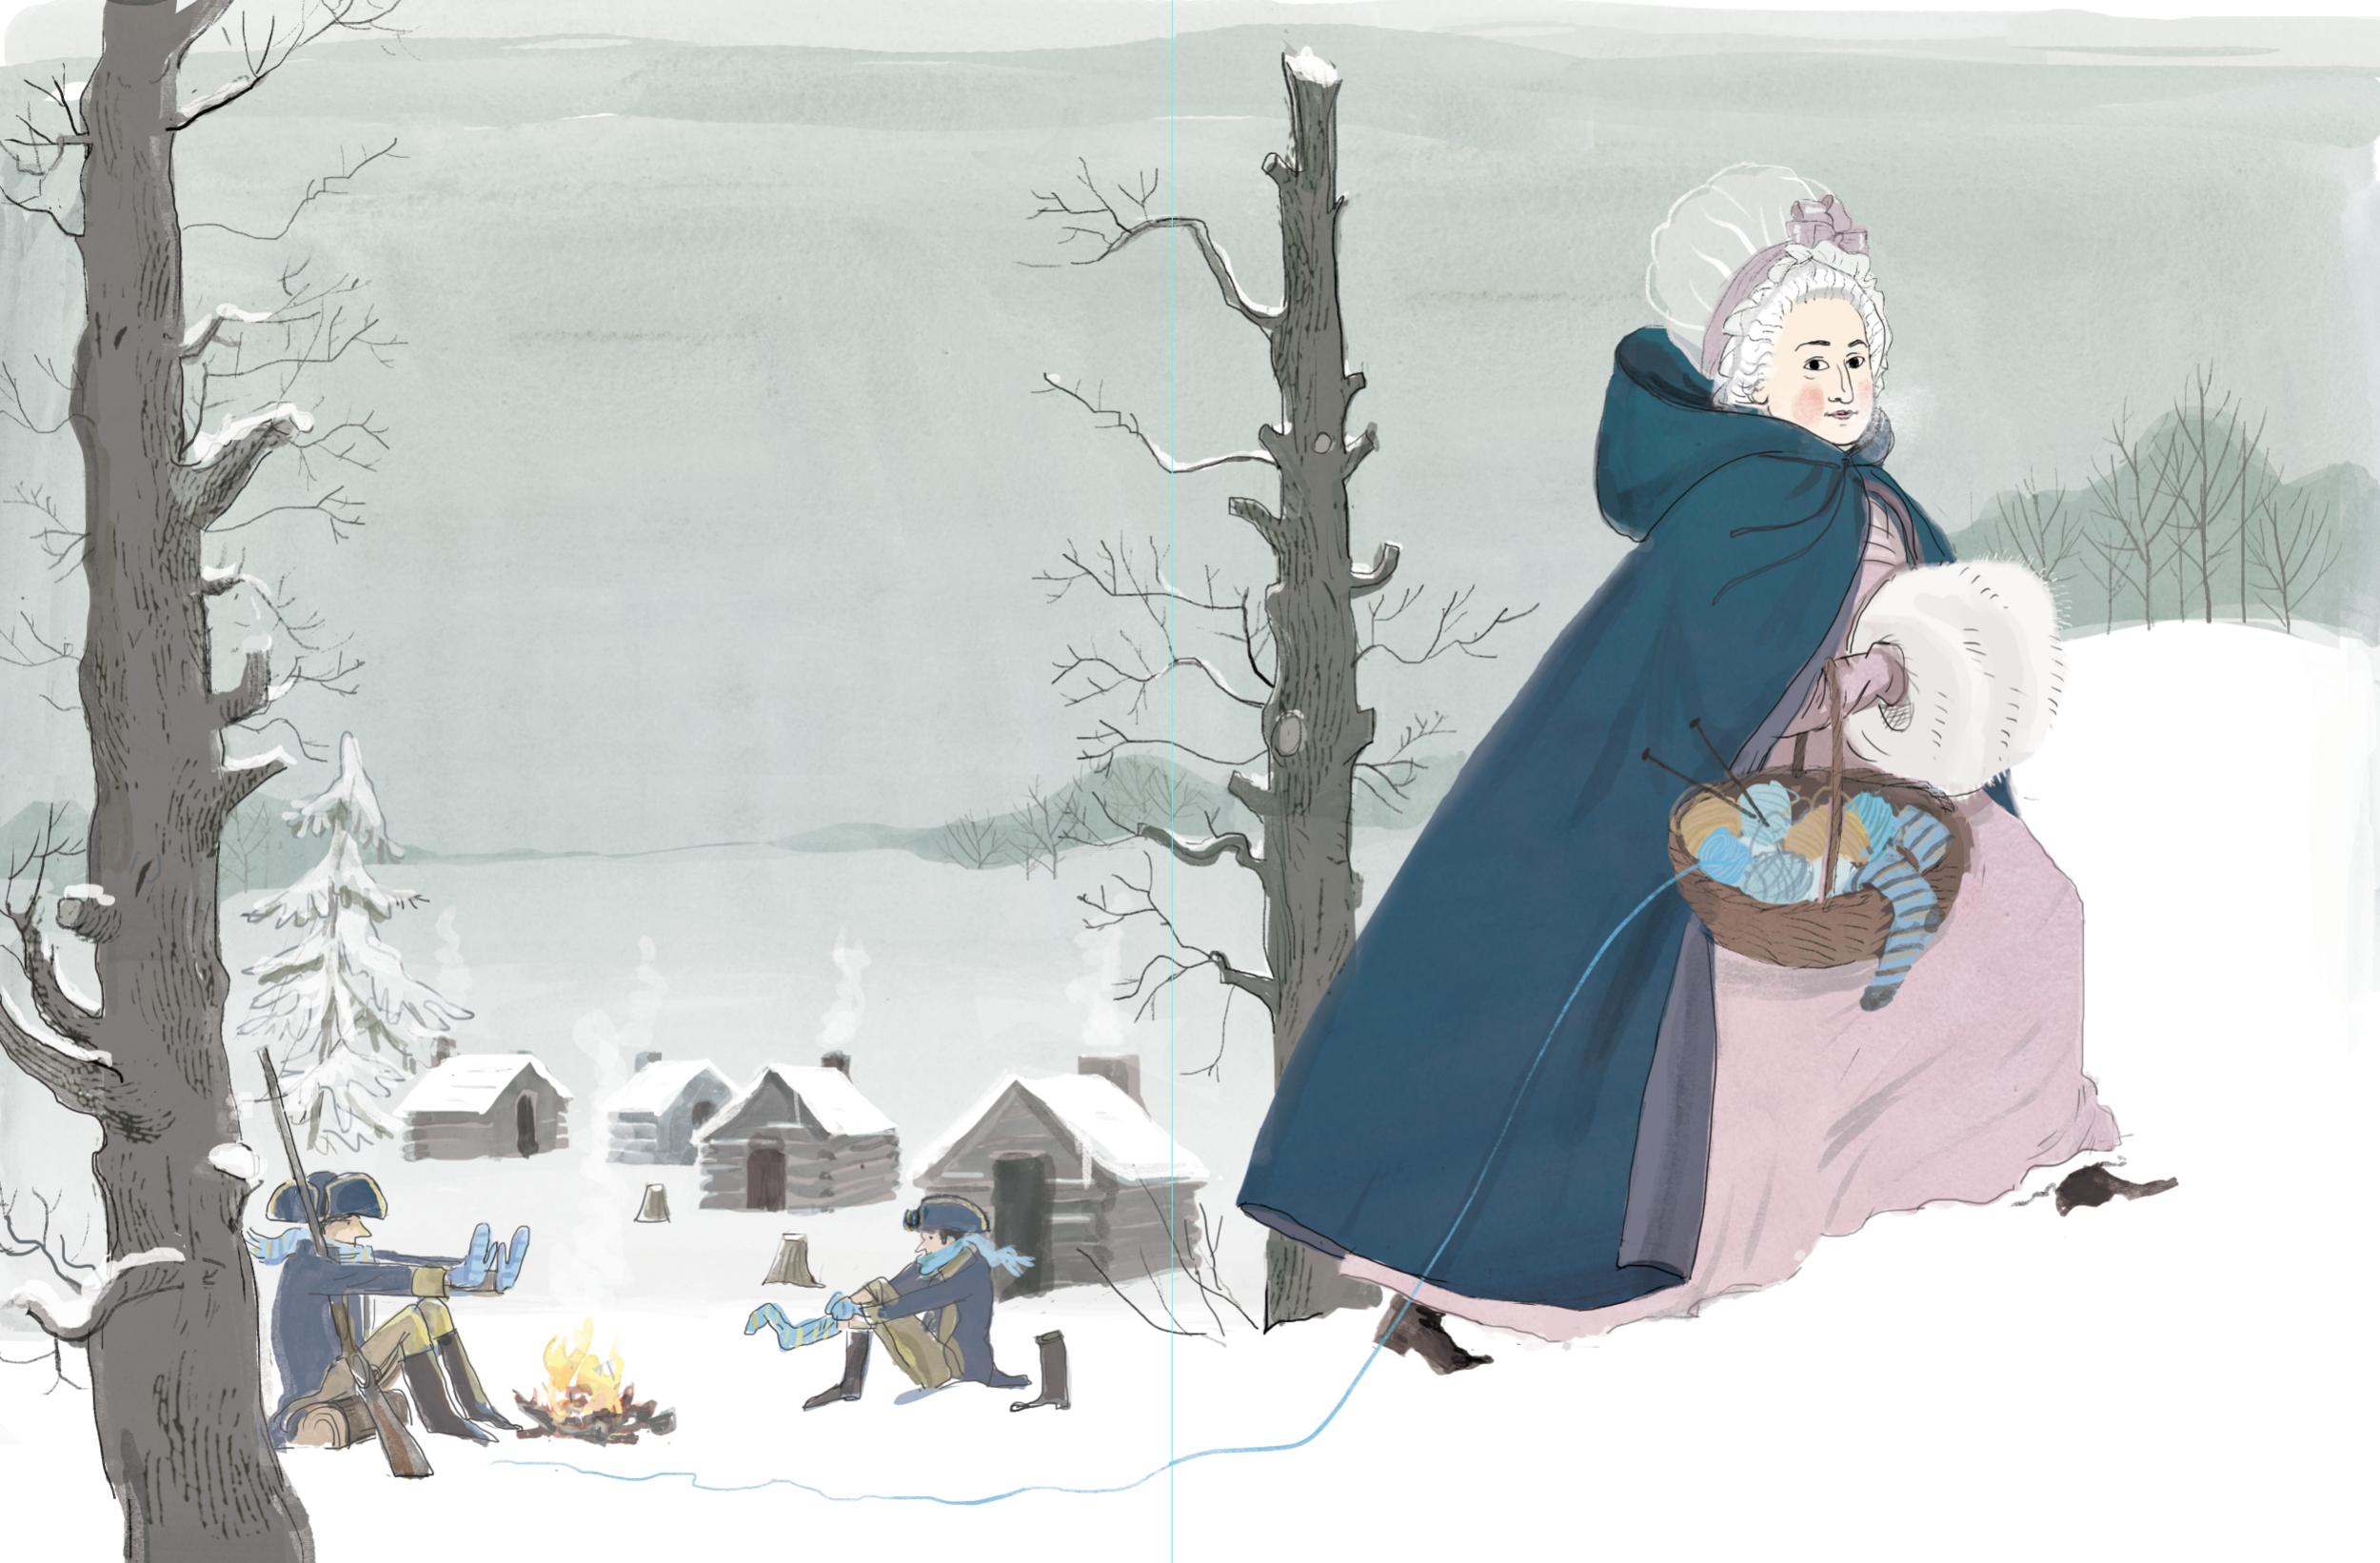 Martha Washington at Valley Forge